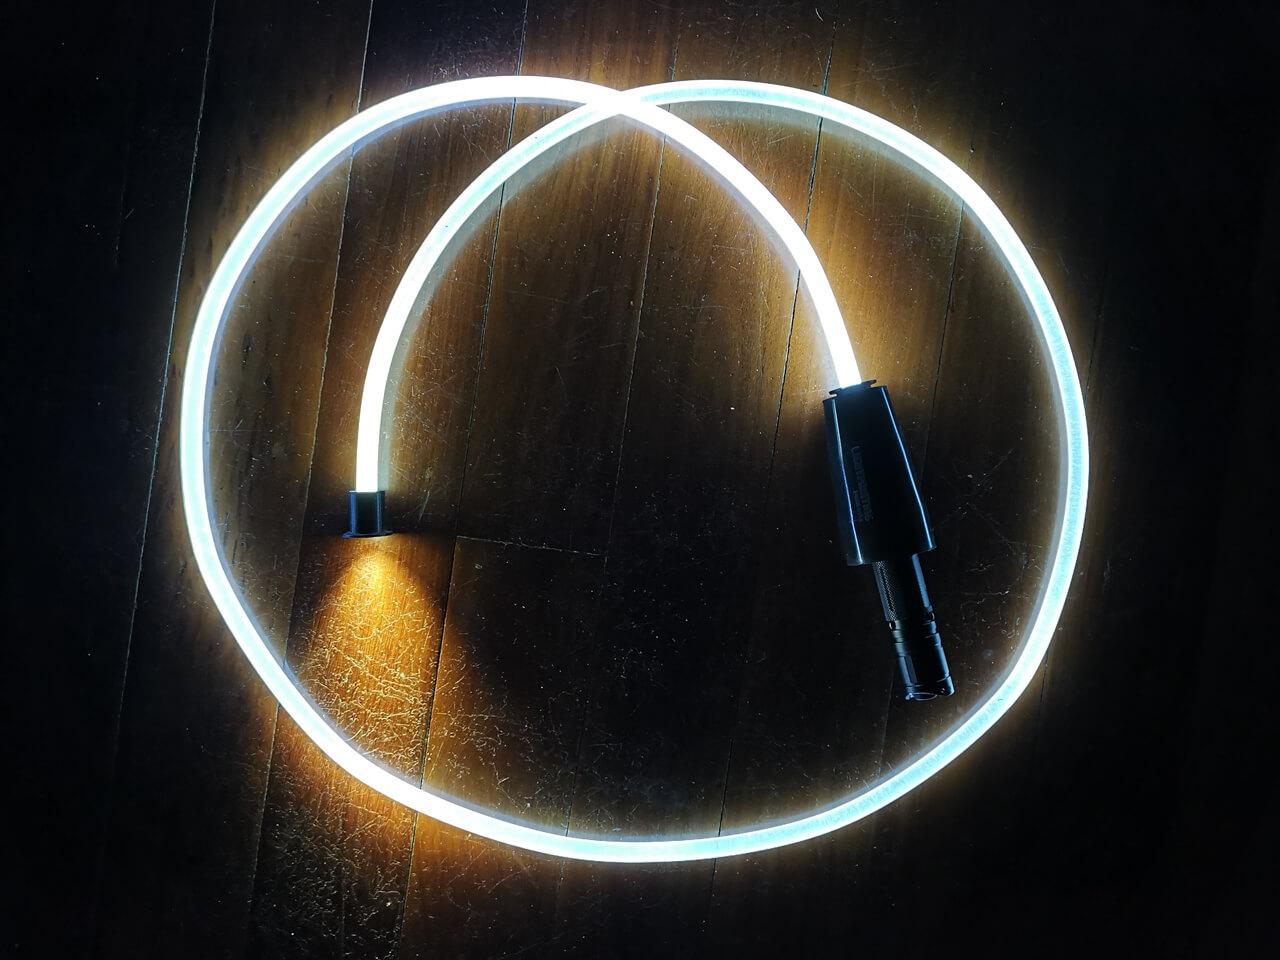 10mm Fiber Optic